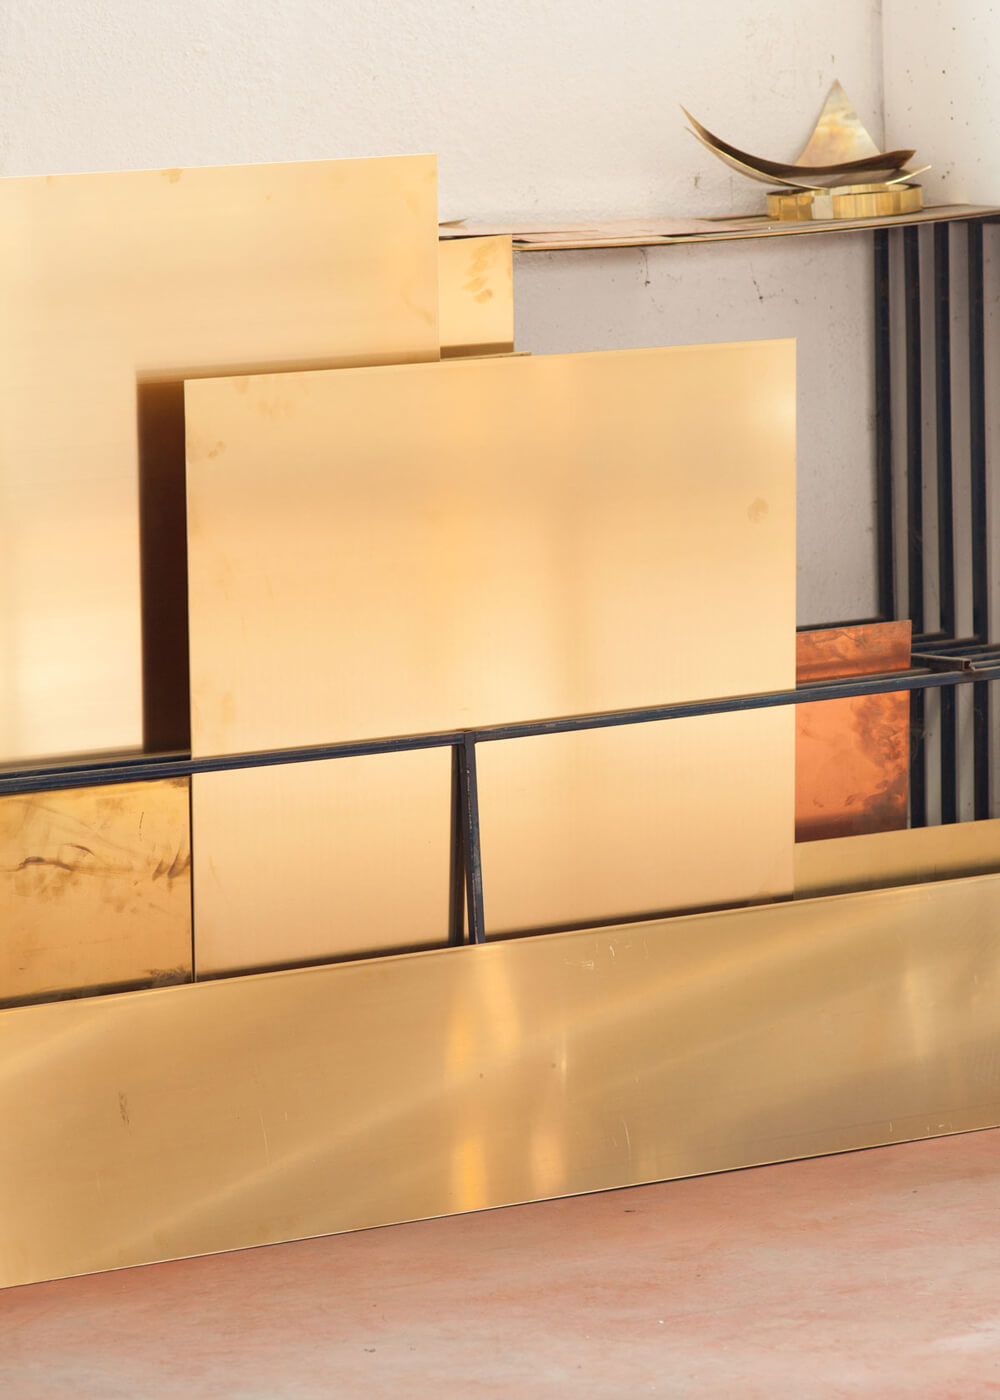 Marco Campardo Brass Elle Collection Wallpaper Design Awards winner for Seeds London Gallery work in progress